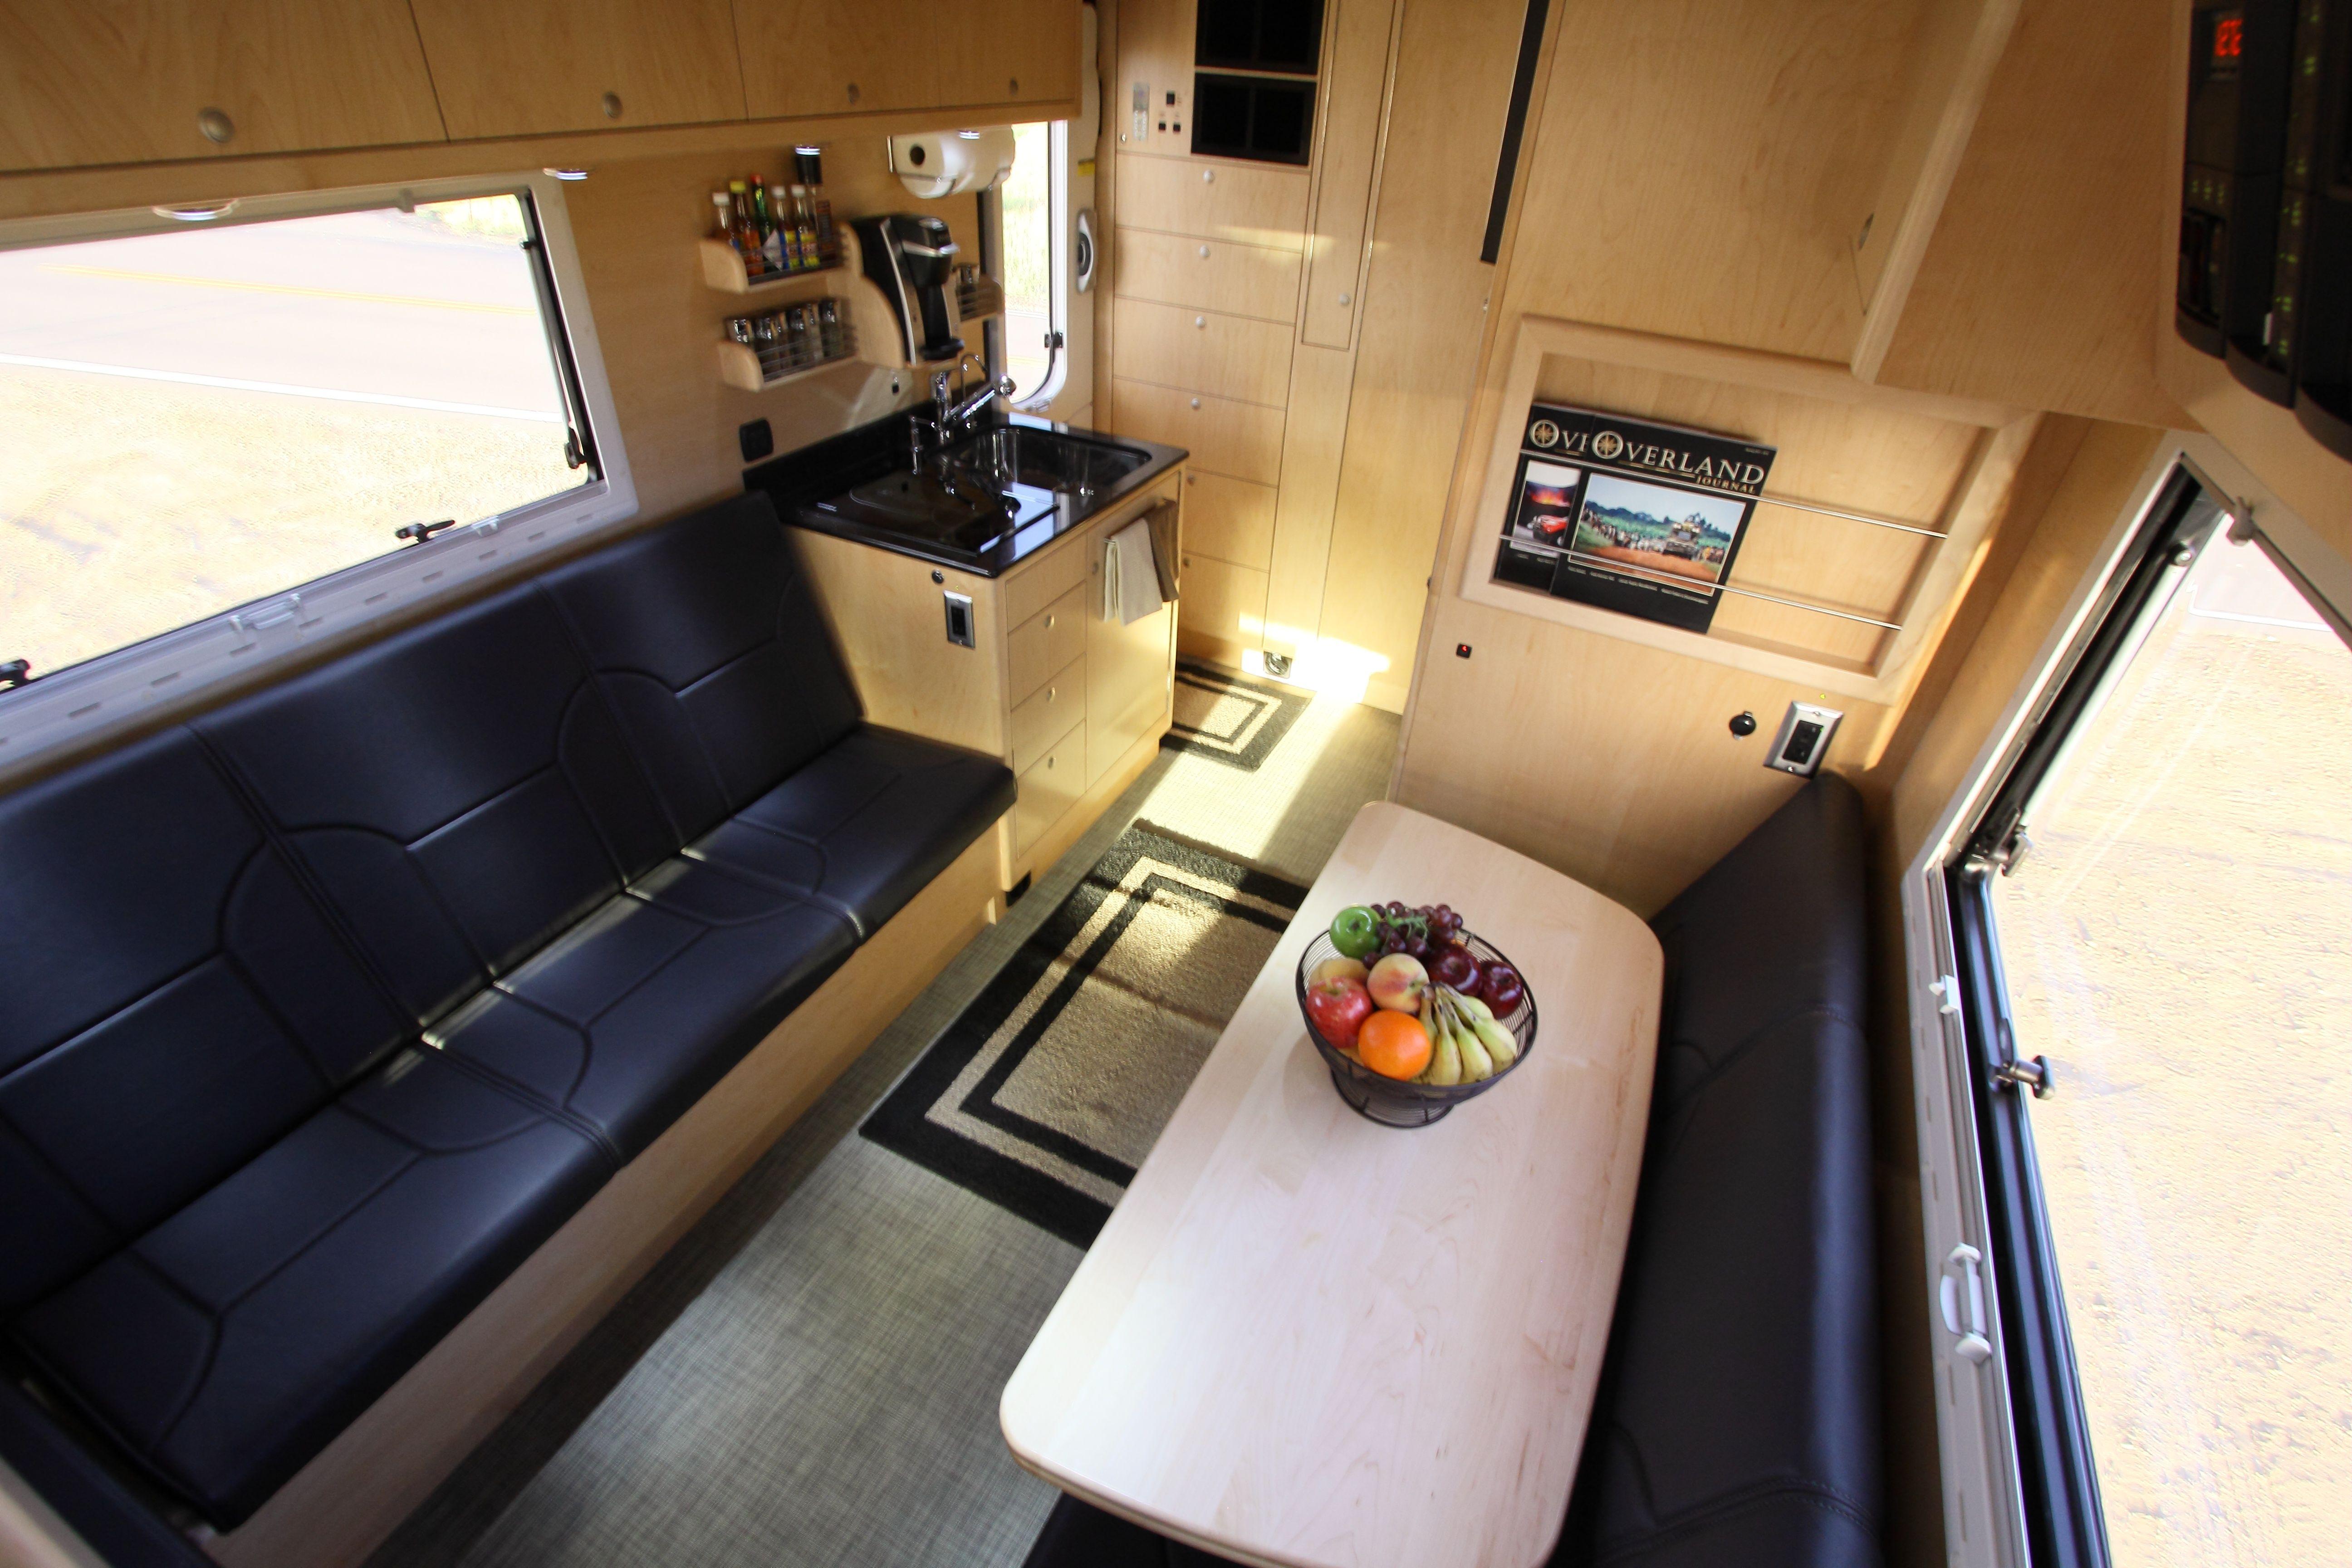 EarthRoamer Home made camper trailer, Truck camper, Off